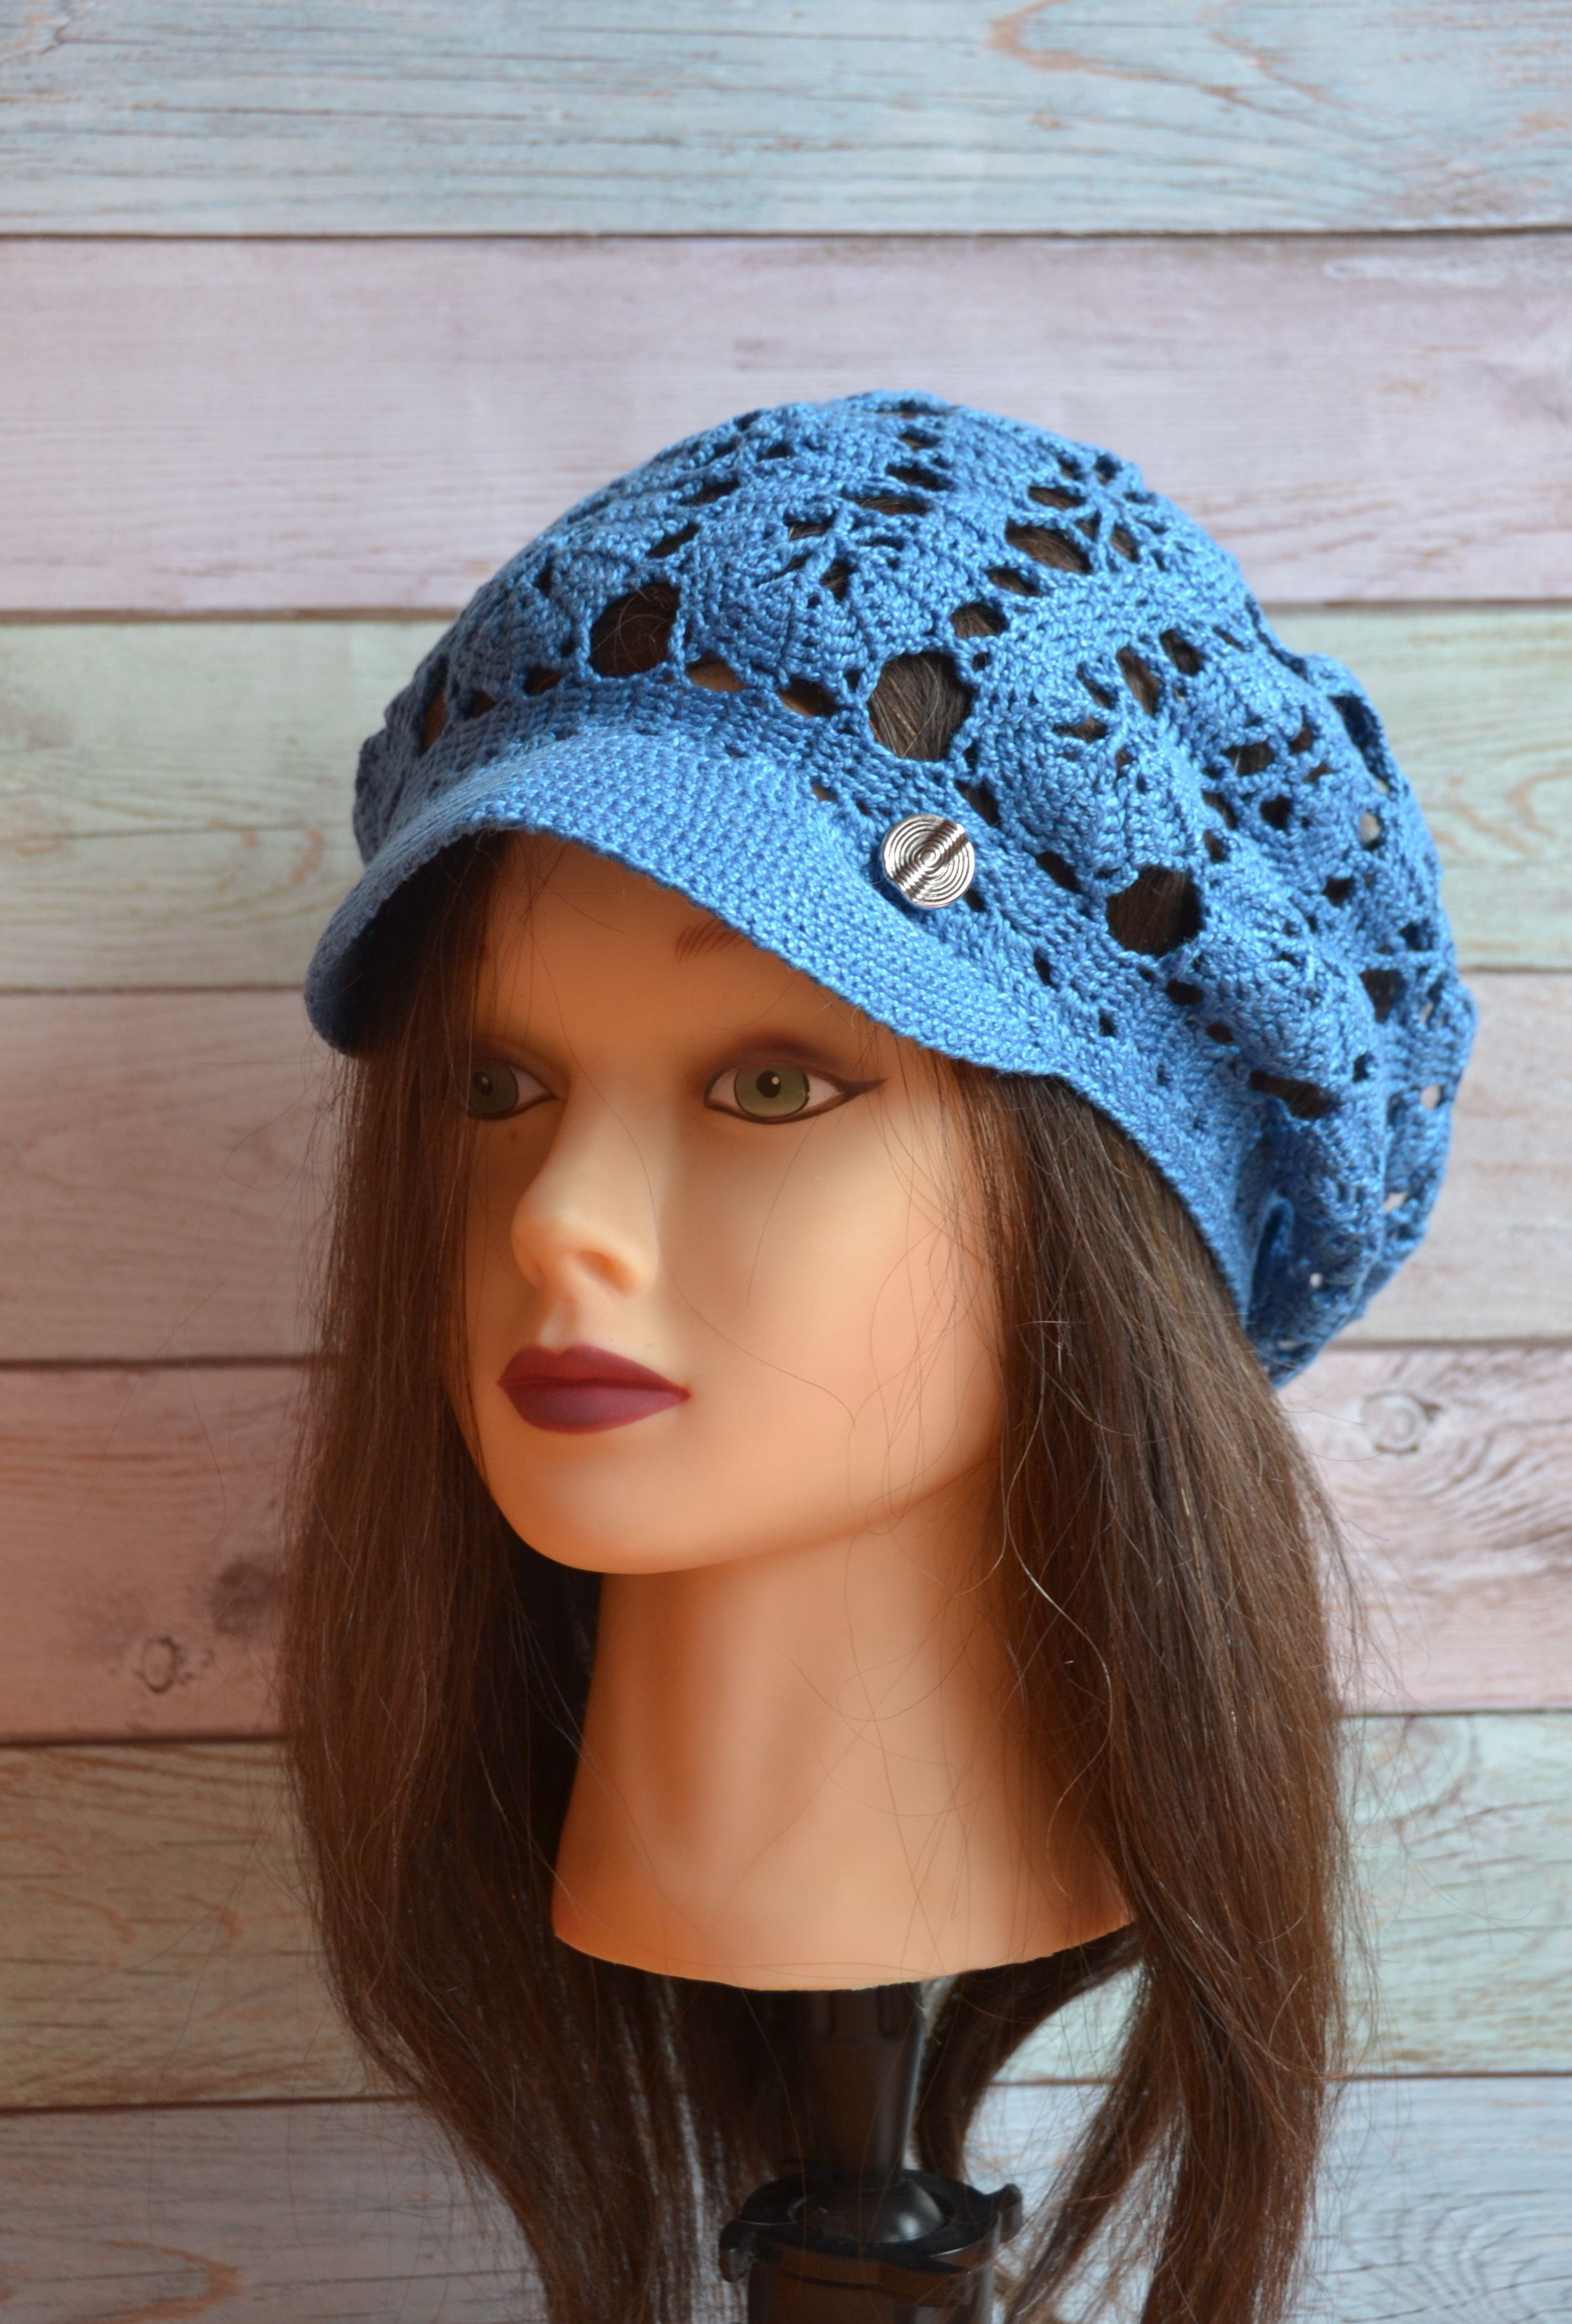 f3e3dae7fbe Crochet Cotton Brim Cap Beret visor Summer Slouchy Textured Mesh ...